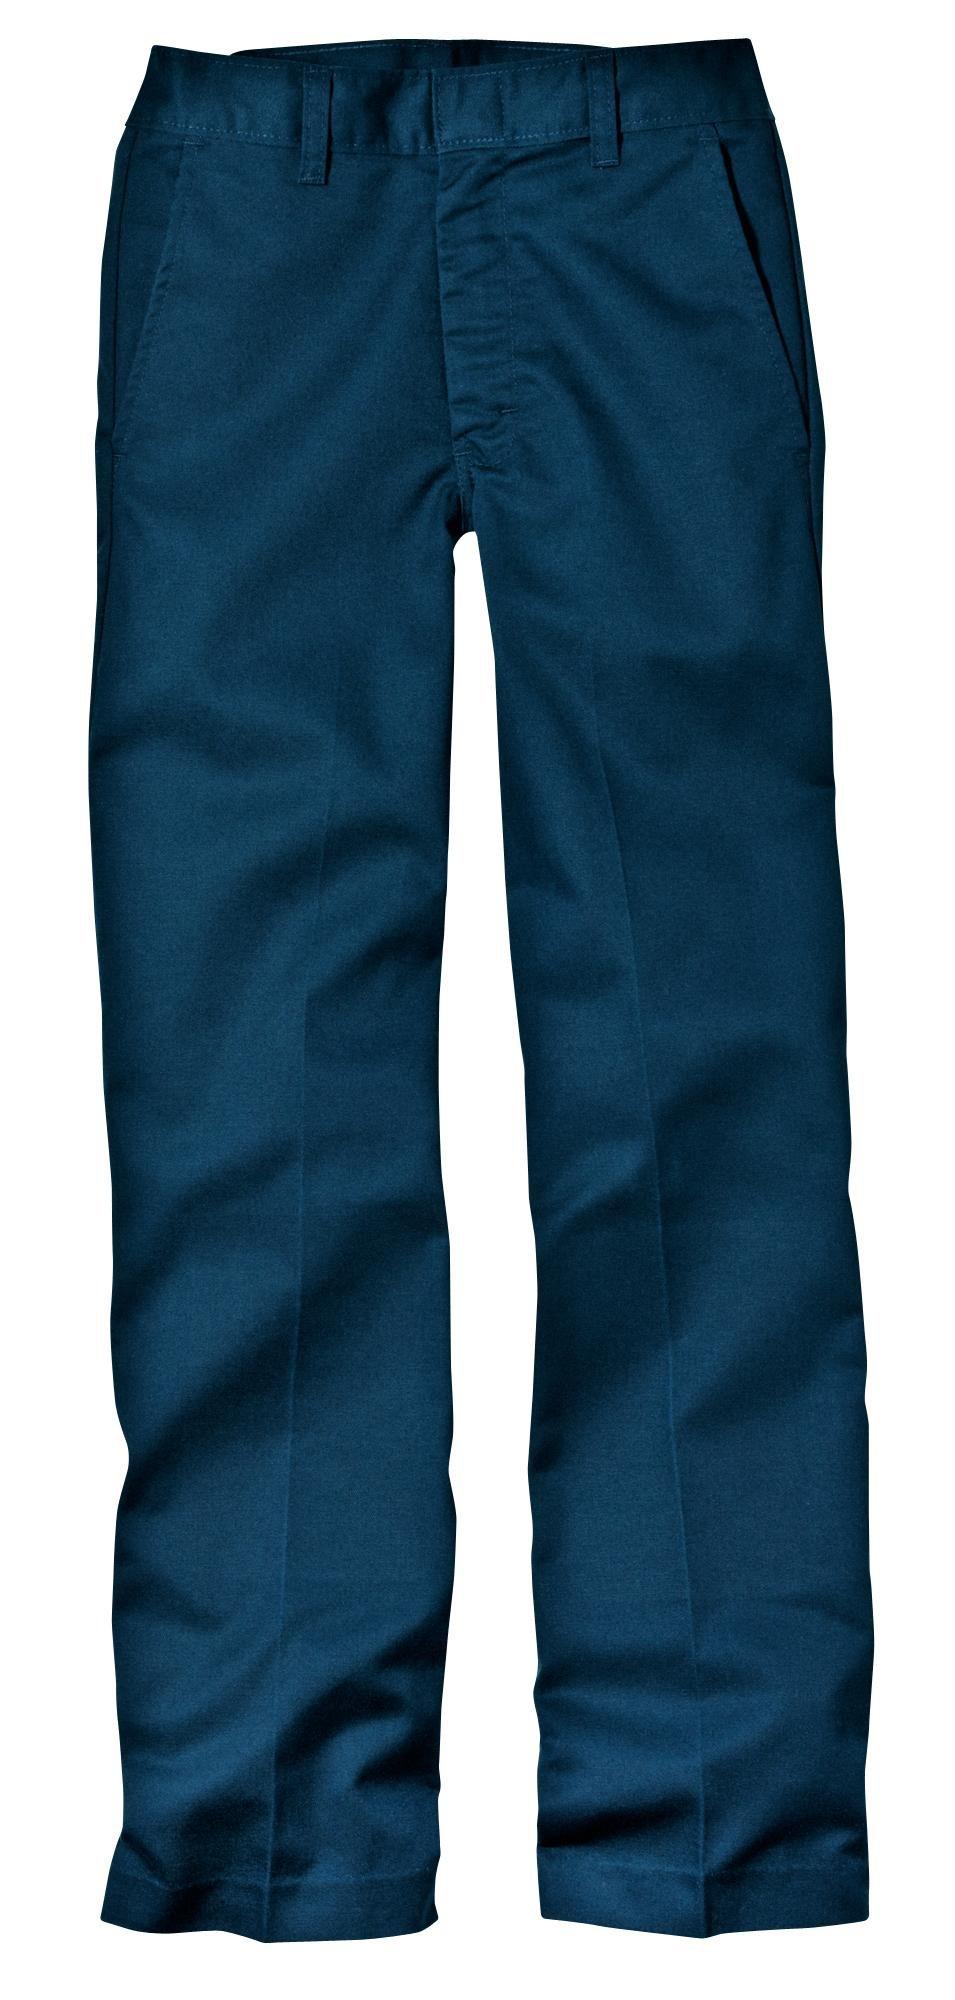 Dickies Husky Boys Flat Front Pant, Dark Navy, 18 Husky/34'' x 31''